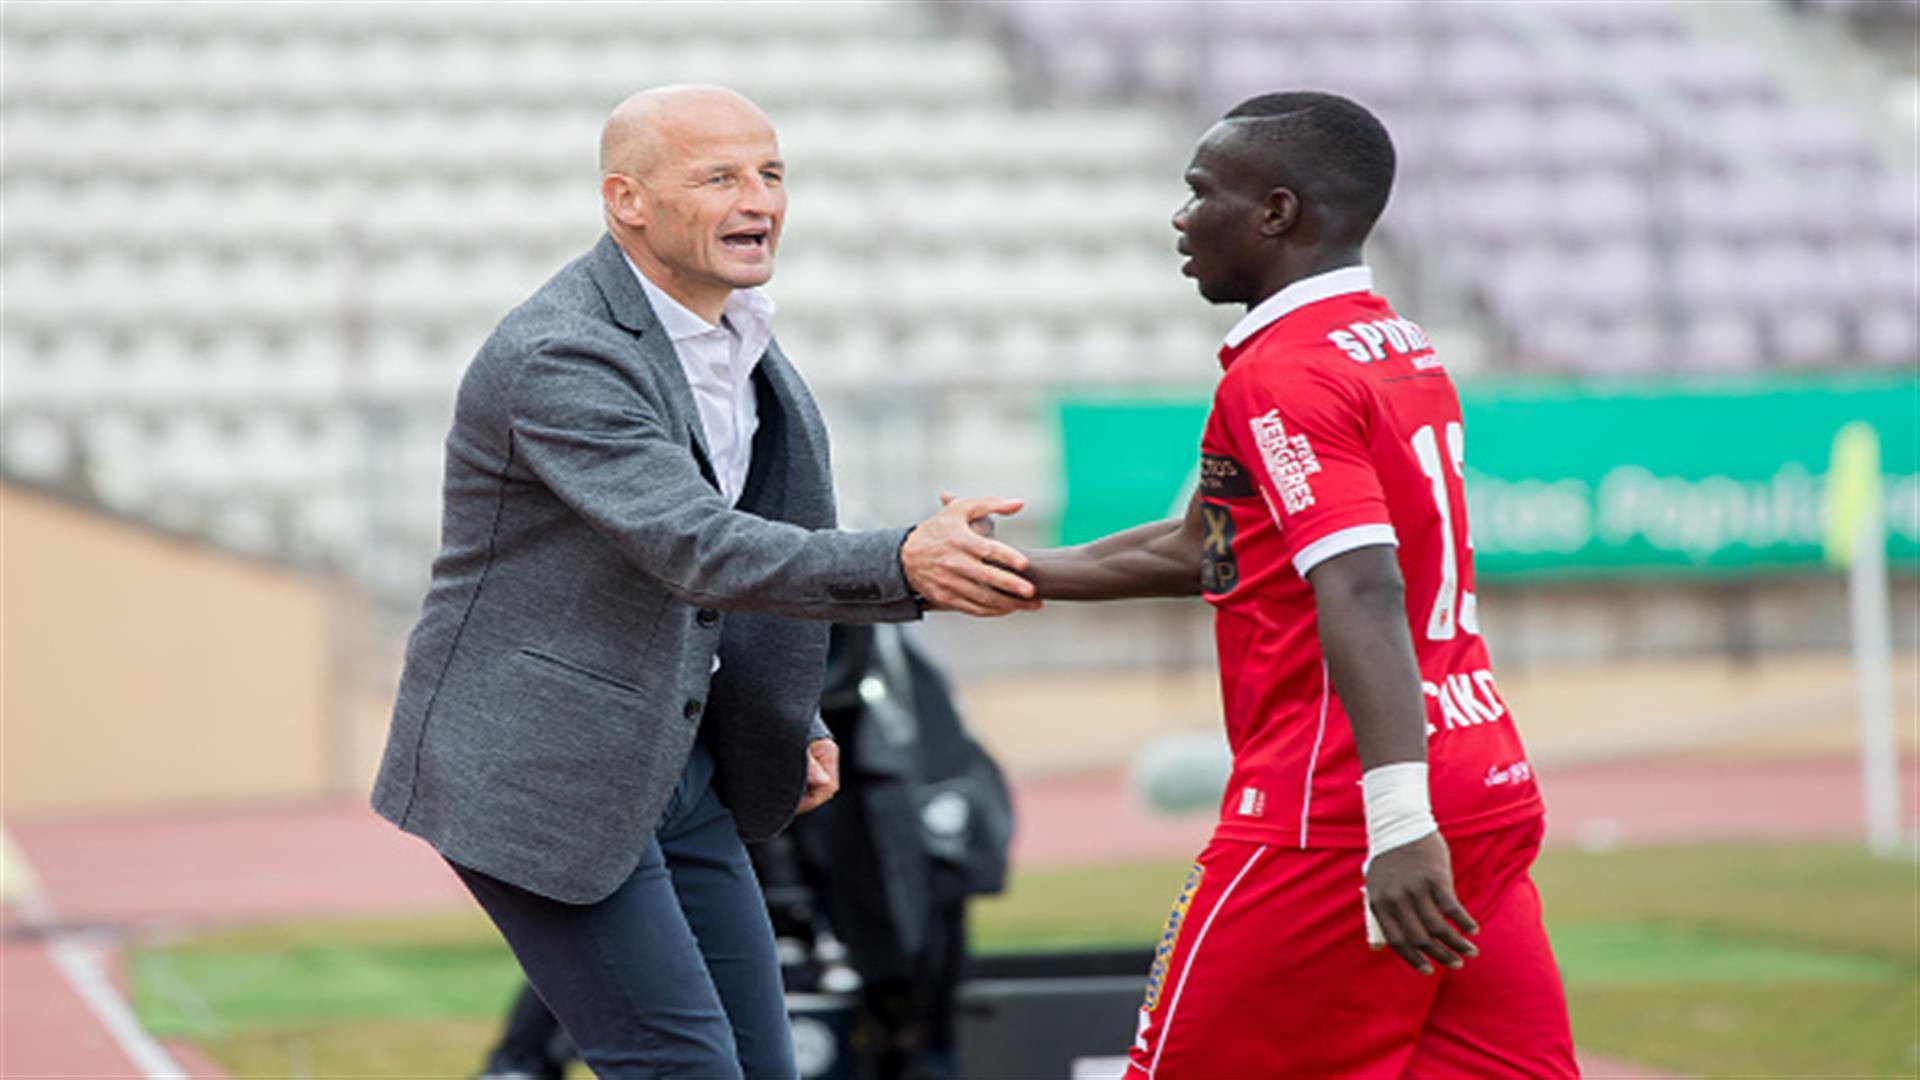 Sebastien Fournier and Chadrac Akolo of FC Sion